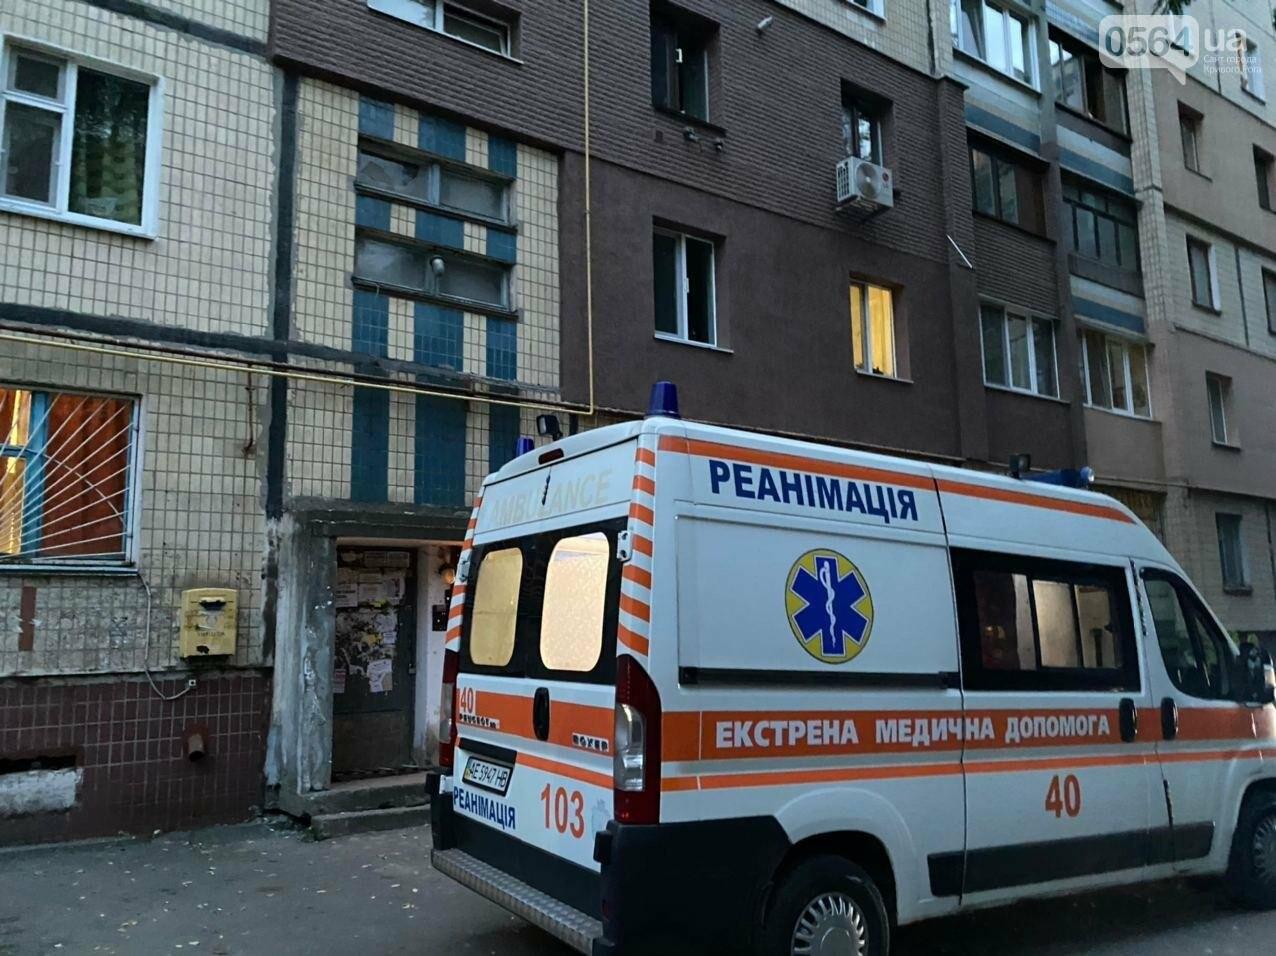 В Кривом Роге погиб мужчина, упавший с 5 этажа жилого дома, - ФОТО 18+, фото-6